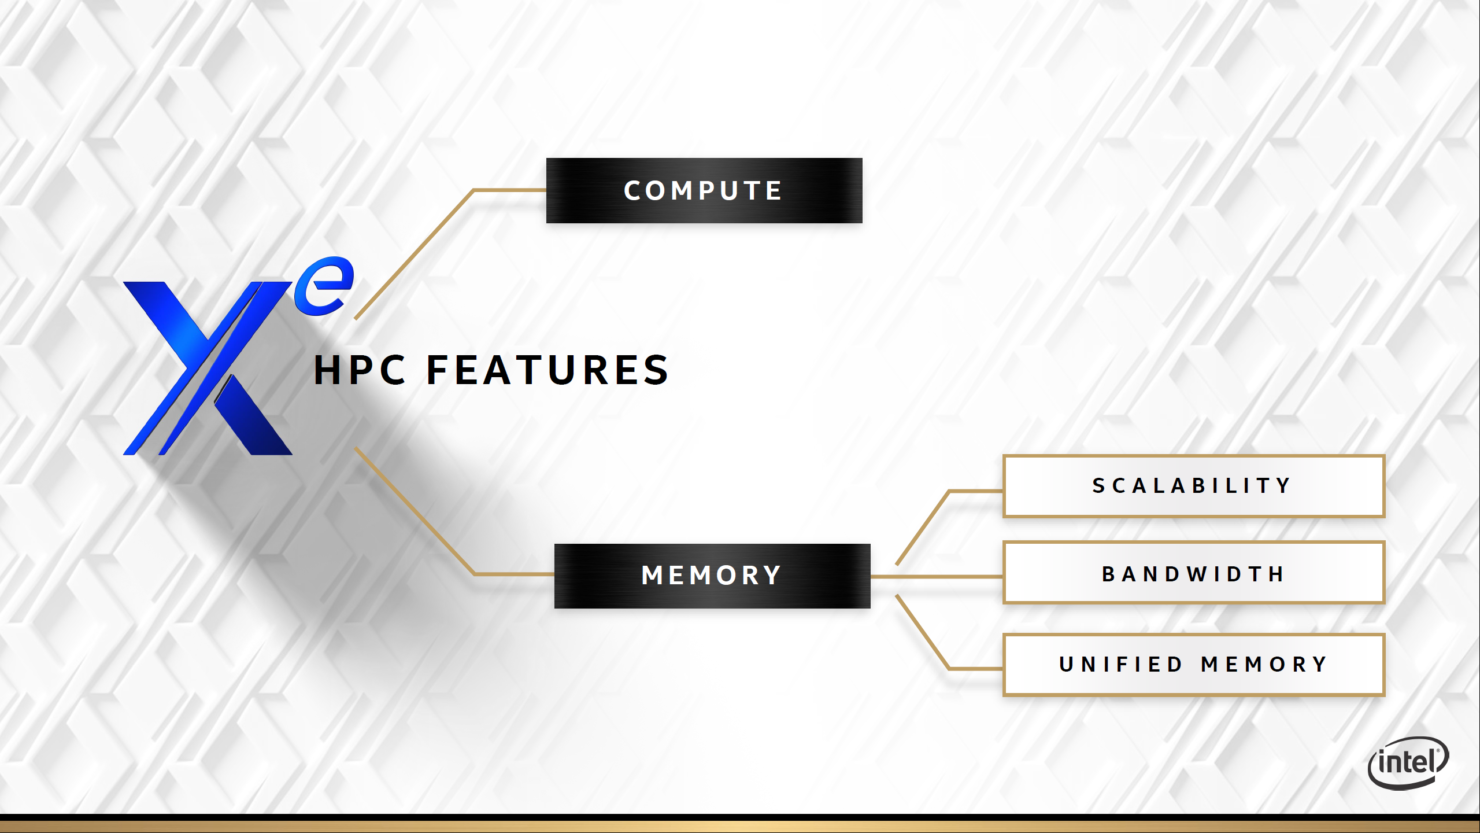 intel-xe-gpu_discrete-graphics-card_22